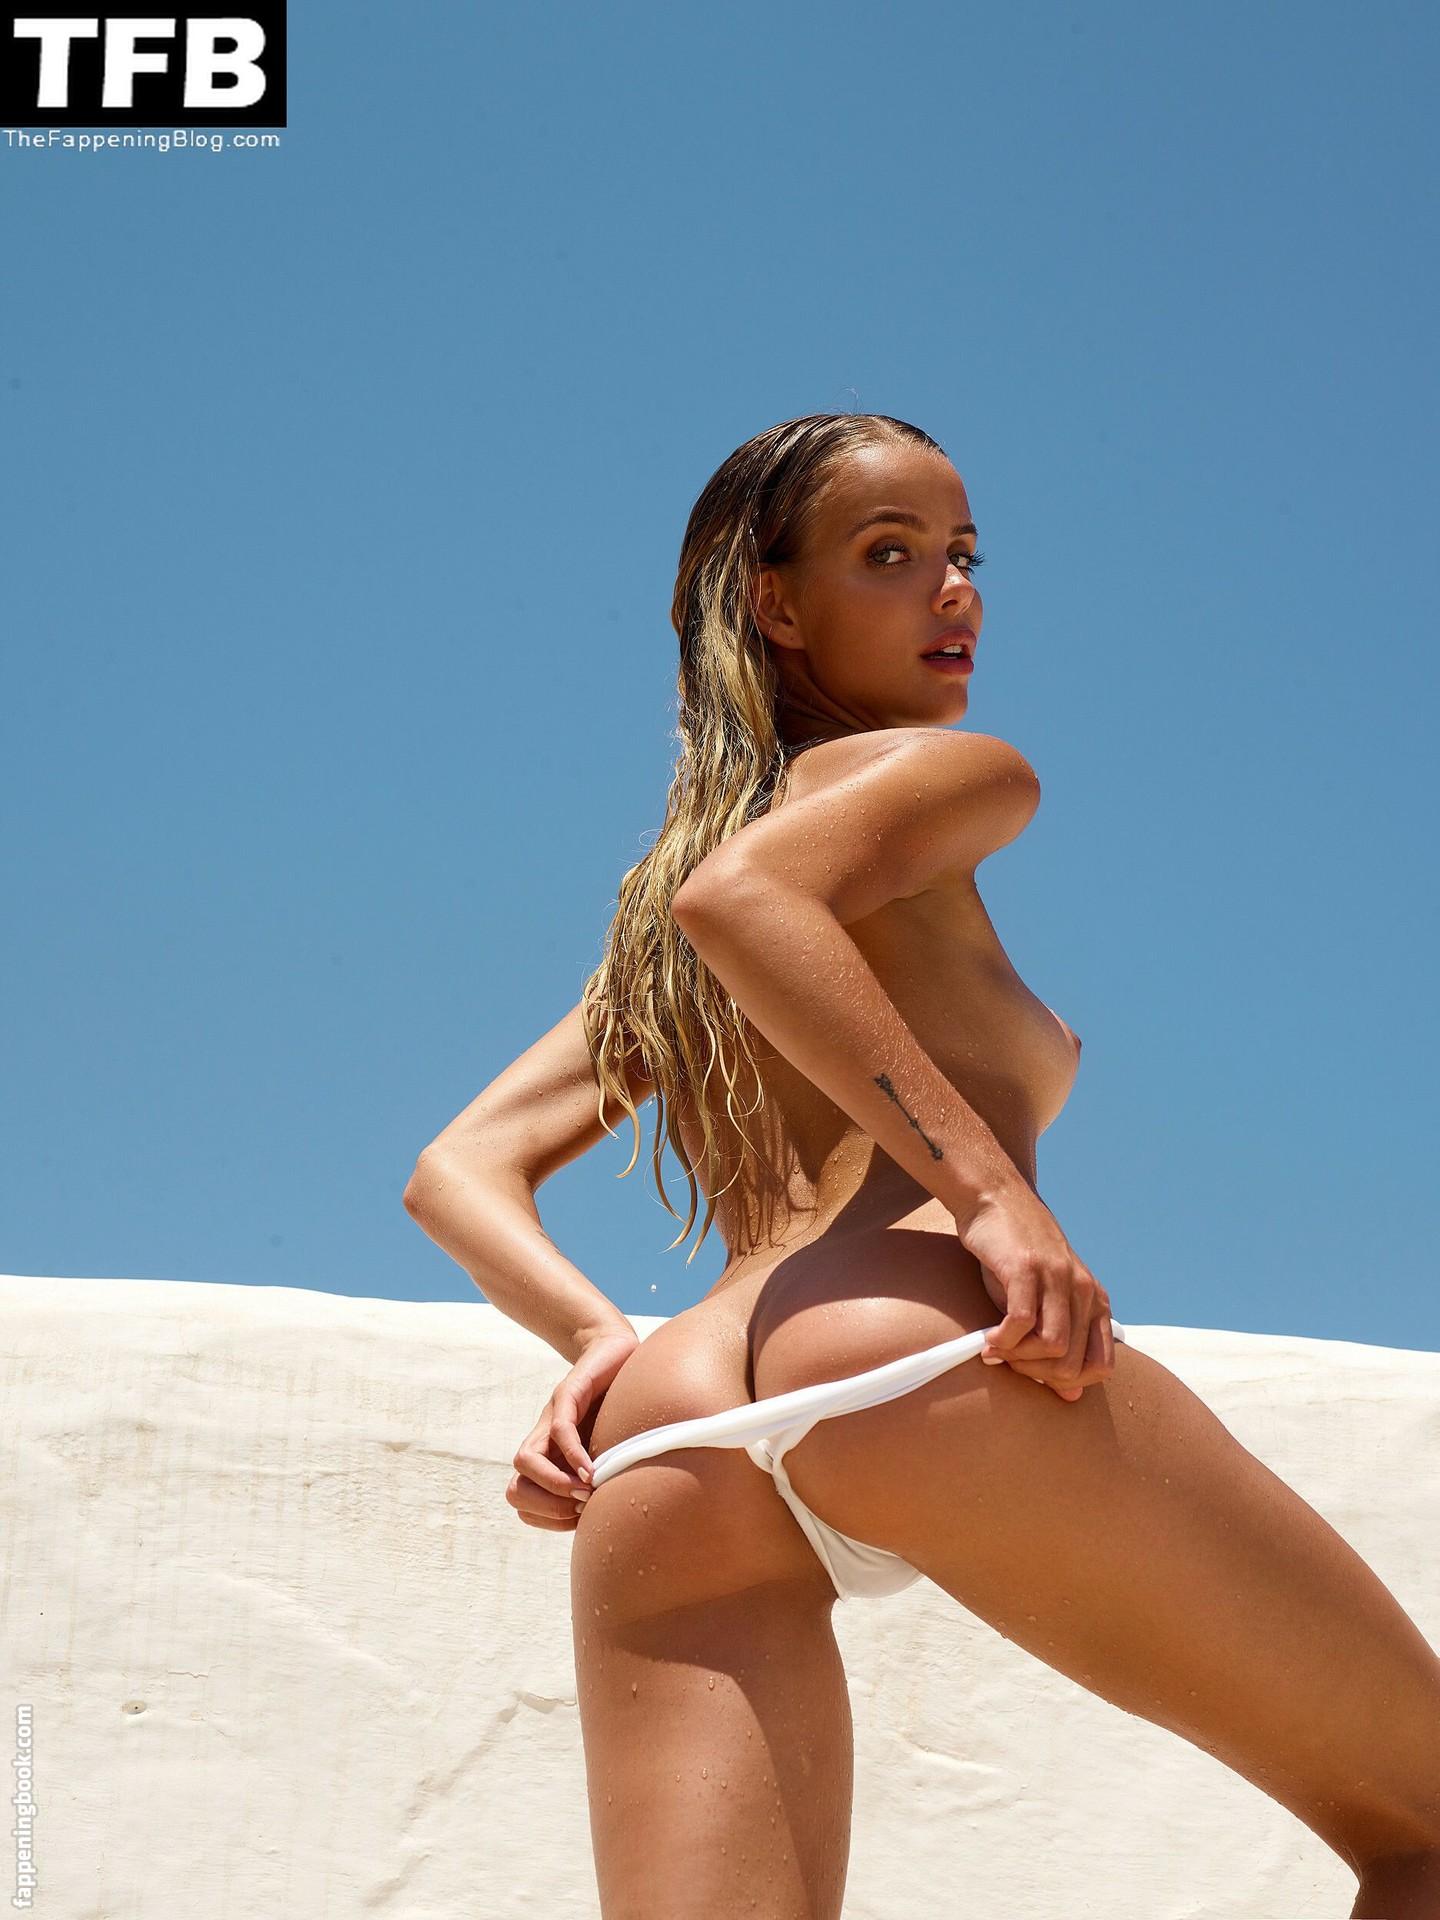 Taylor Brumann Nude